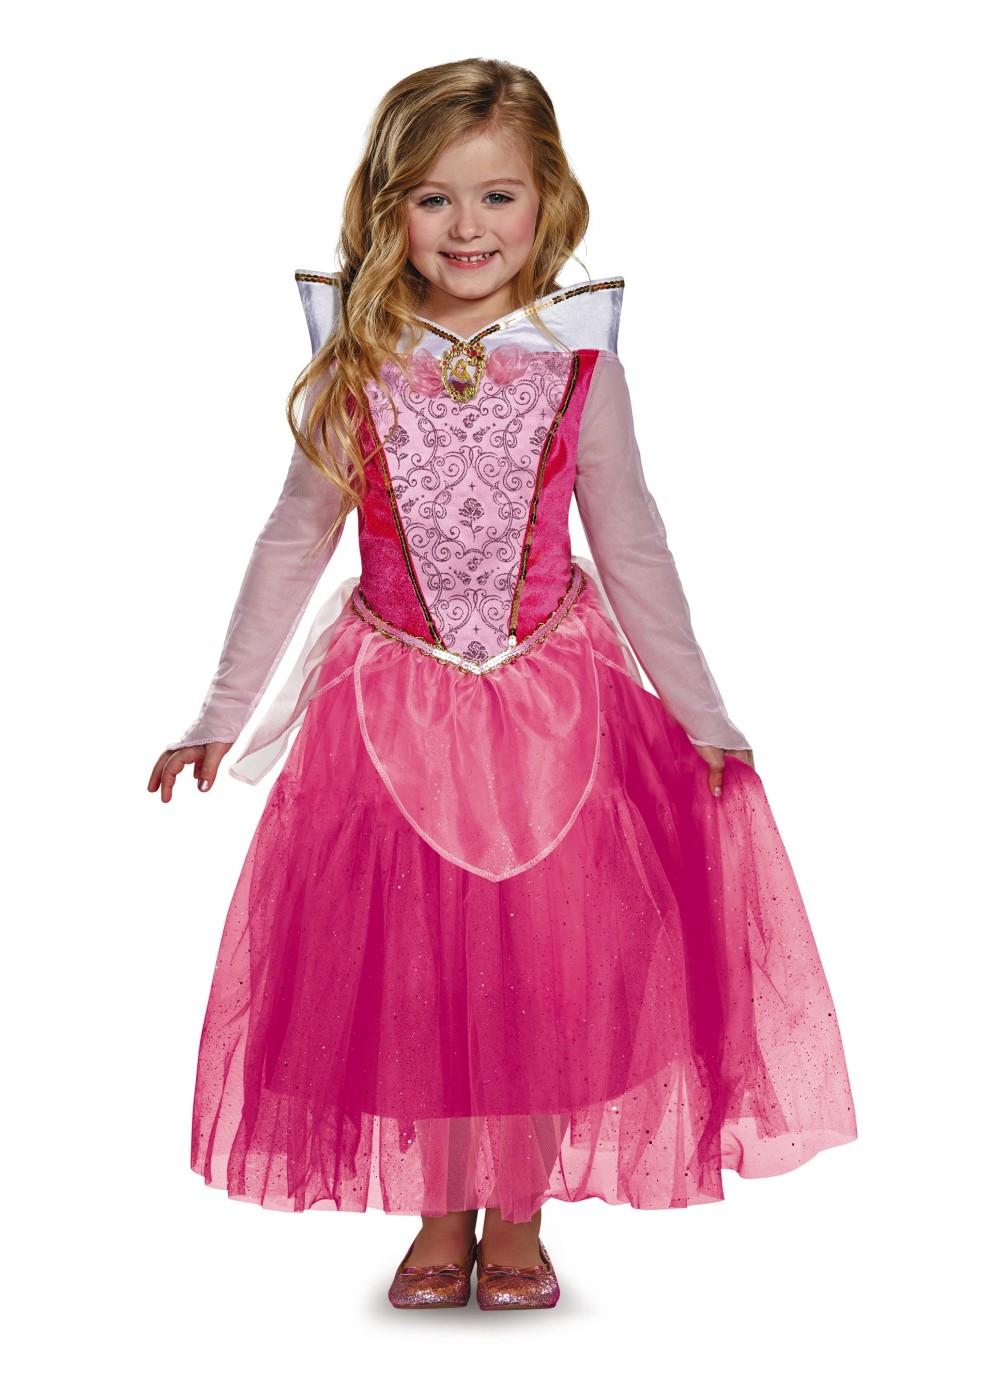 aurora disney girls costume princess costumes. Black Bedroom Furniture Sets. Home Design Ideas